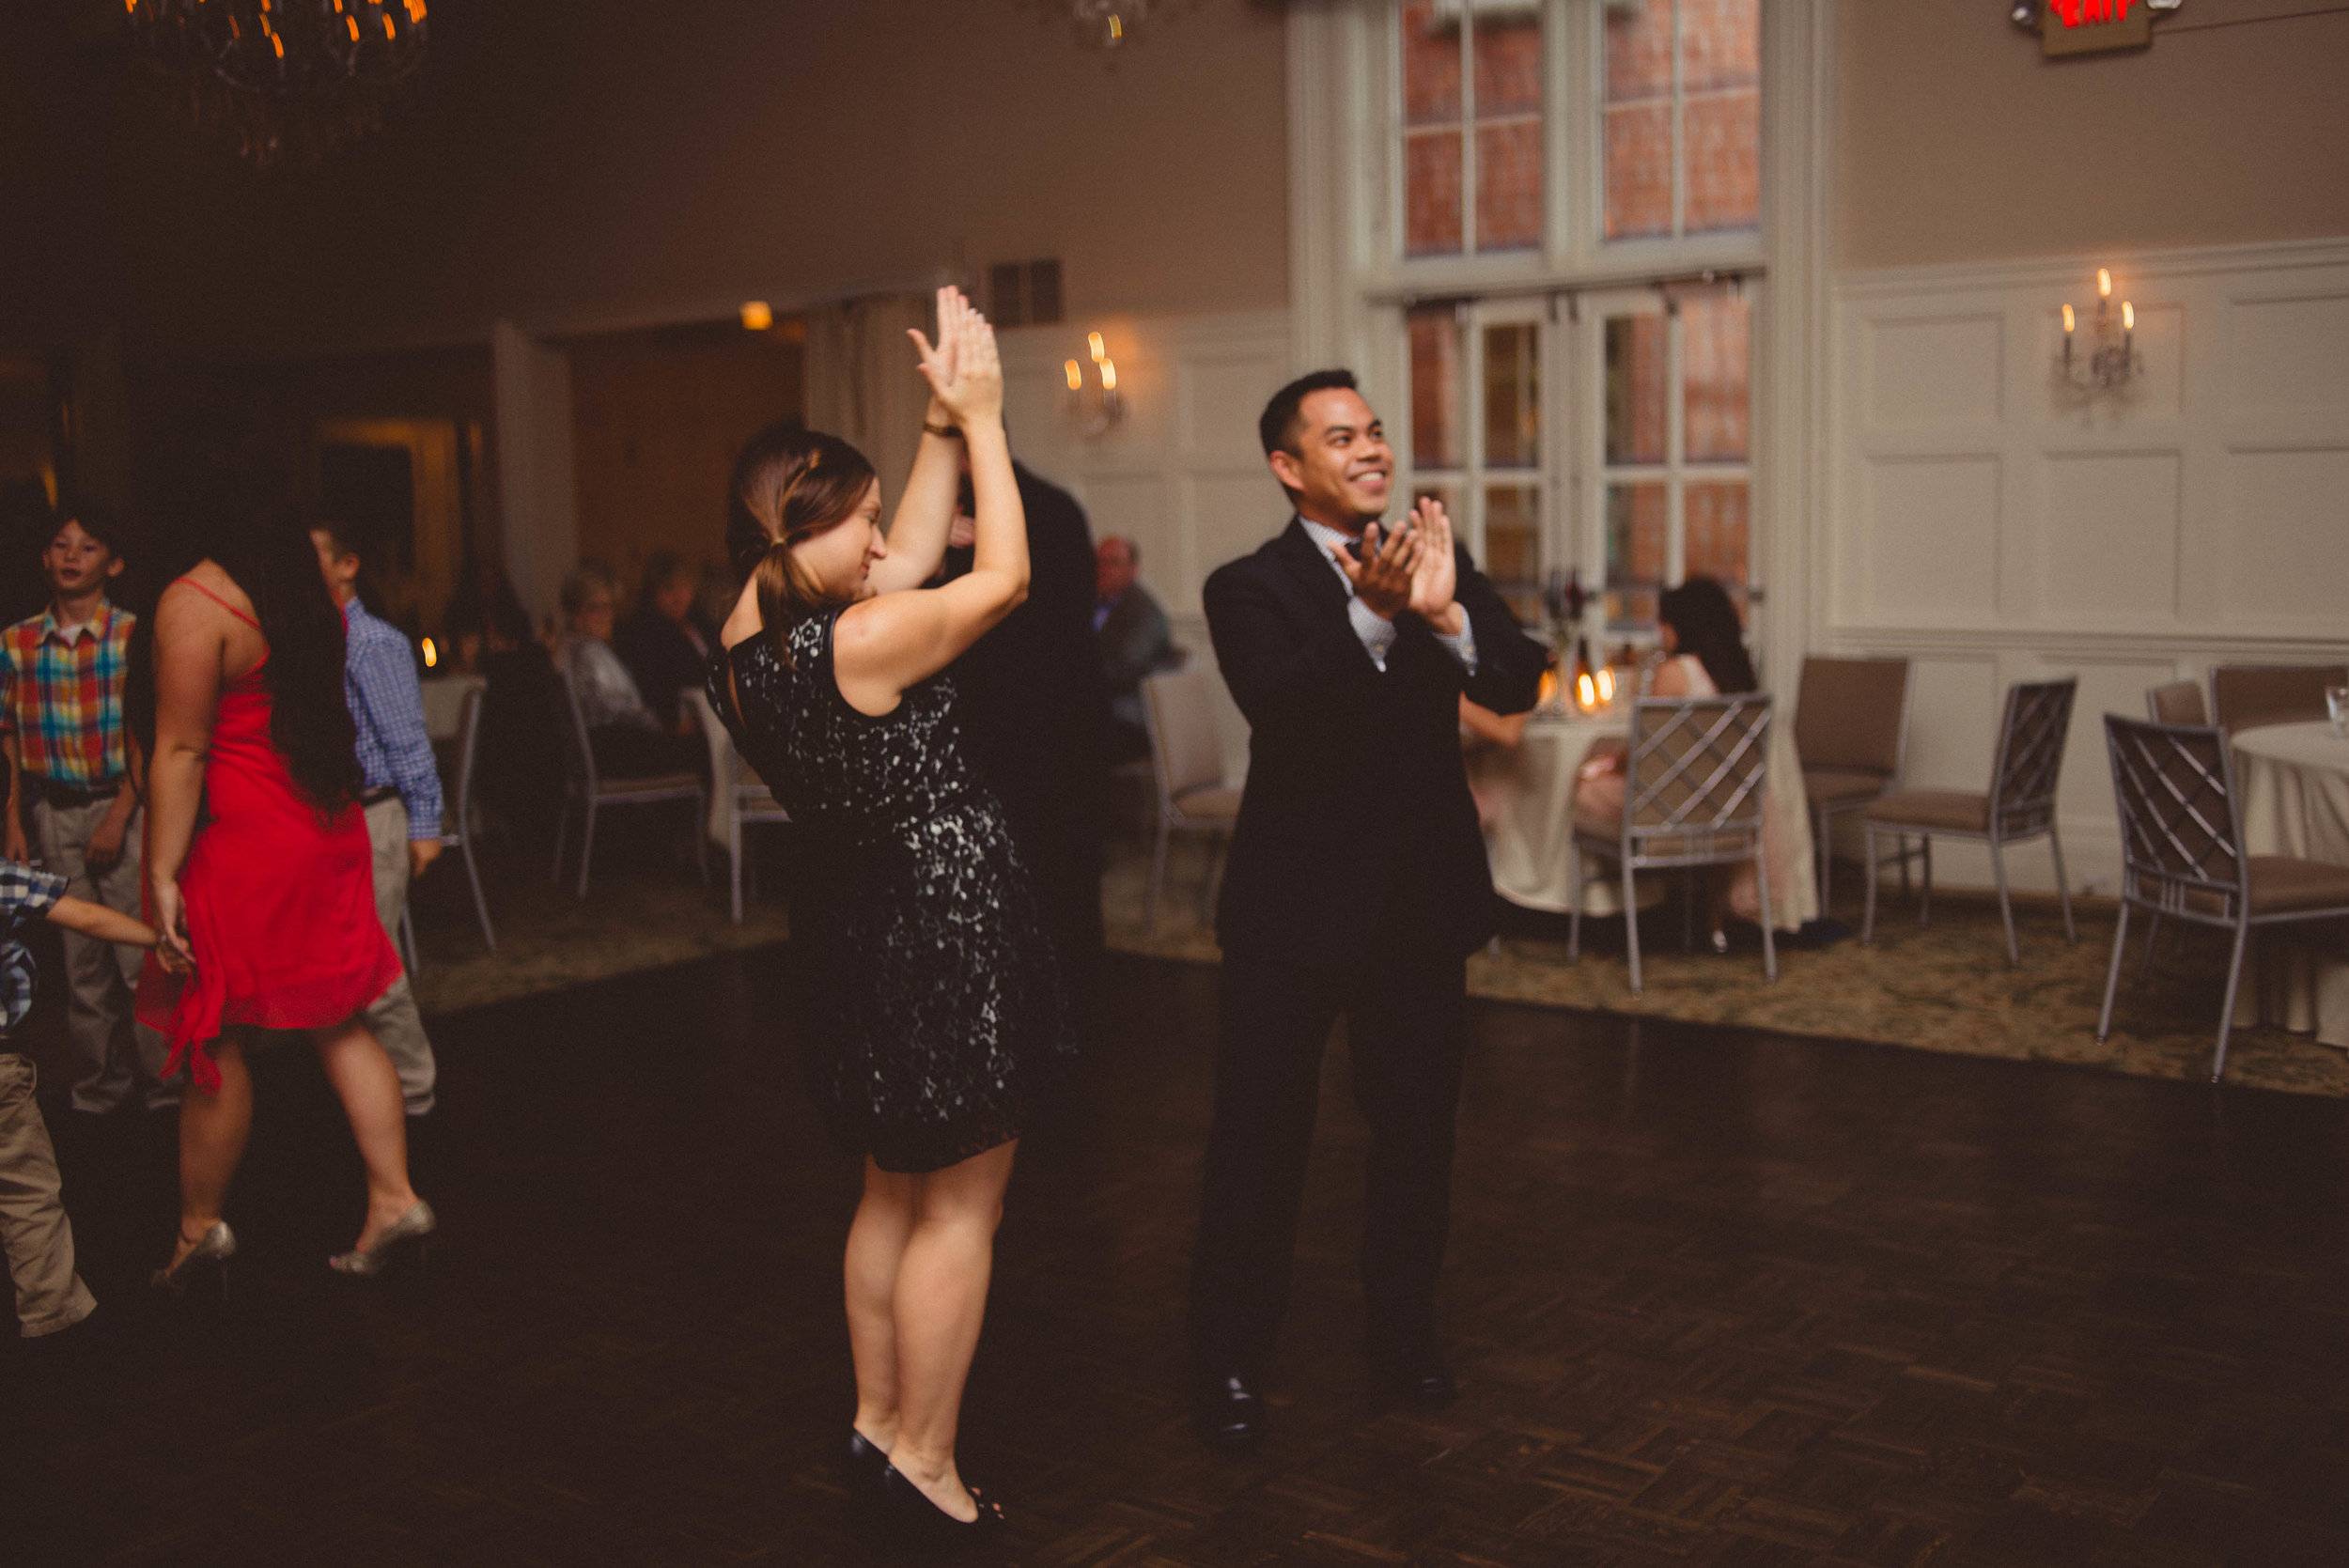 Kara and Mike Wedding-20160904-19-40-26.jpg